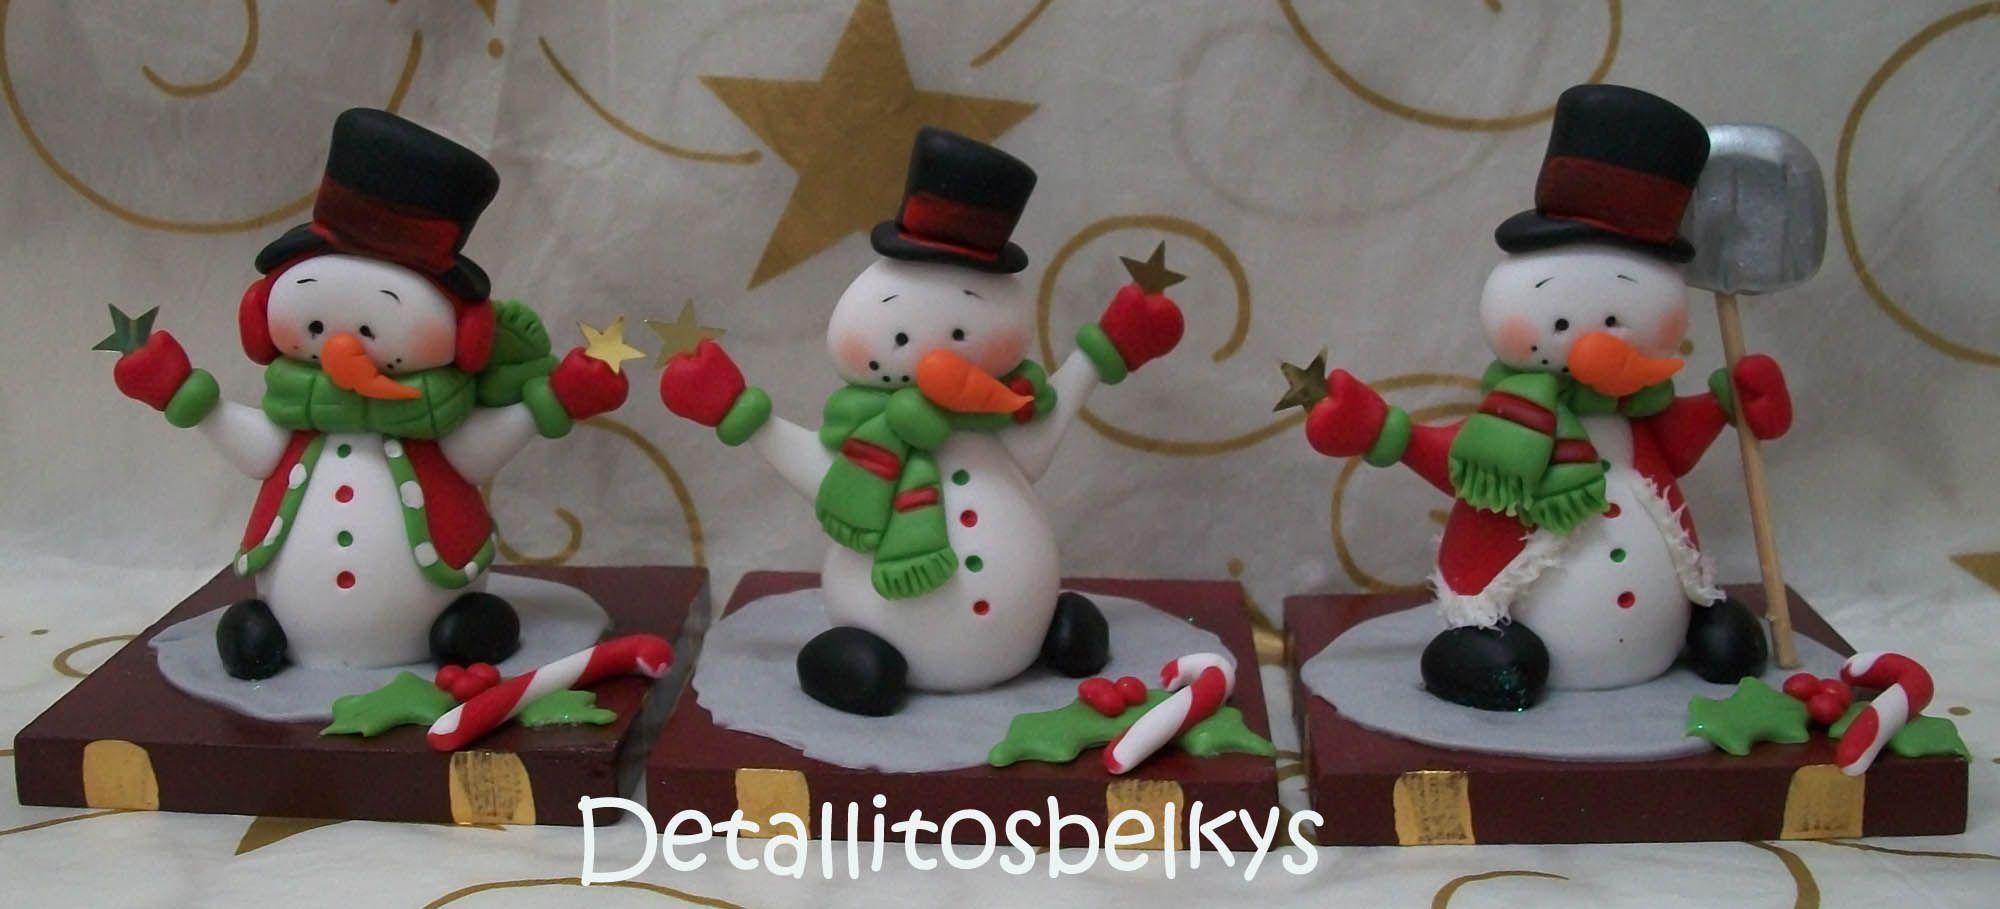 #snowman muñecos de #nieve modelados en #porcelana fría